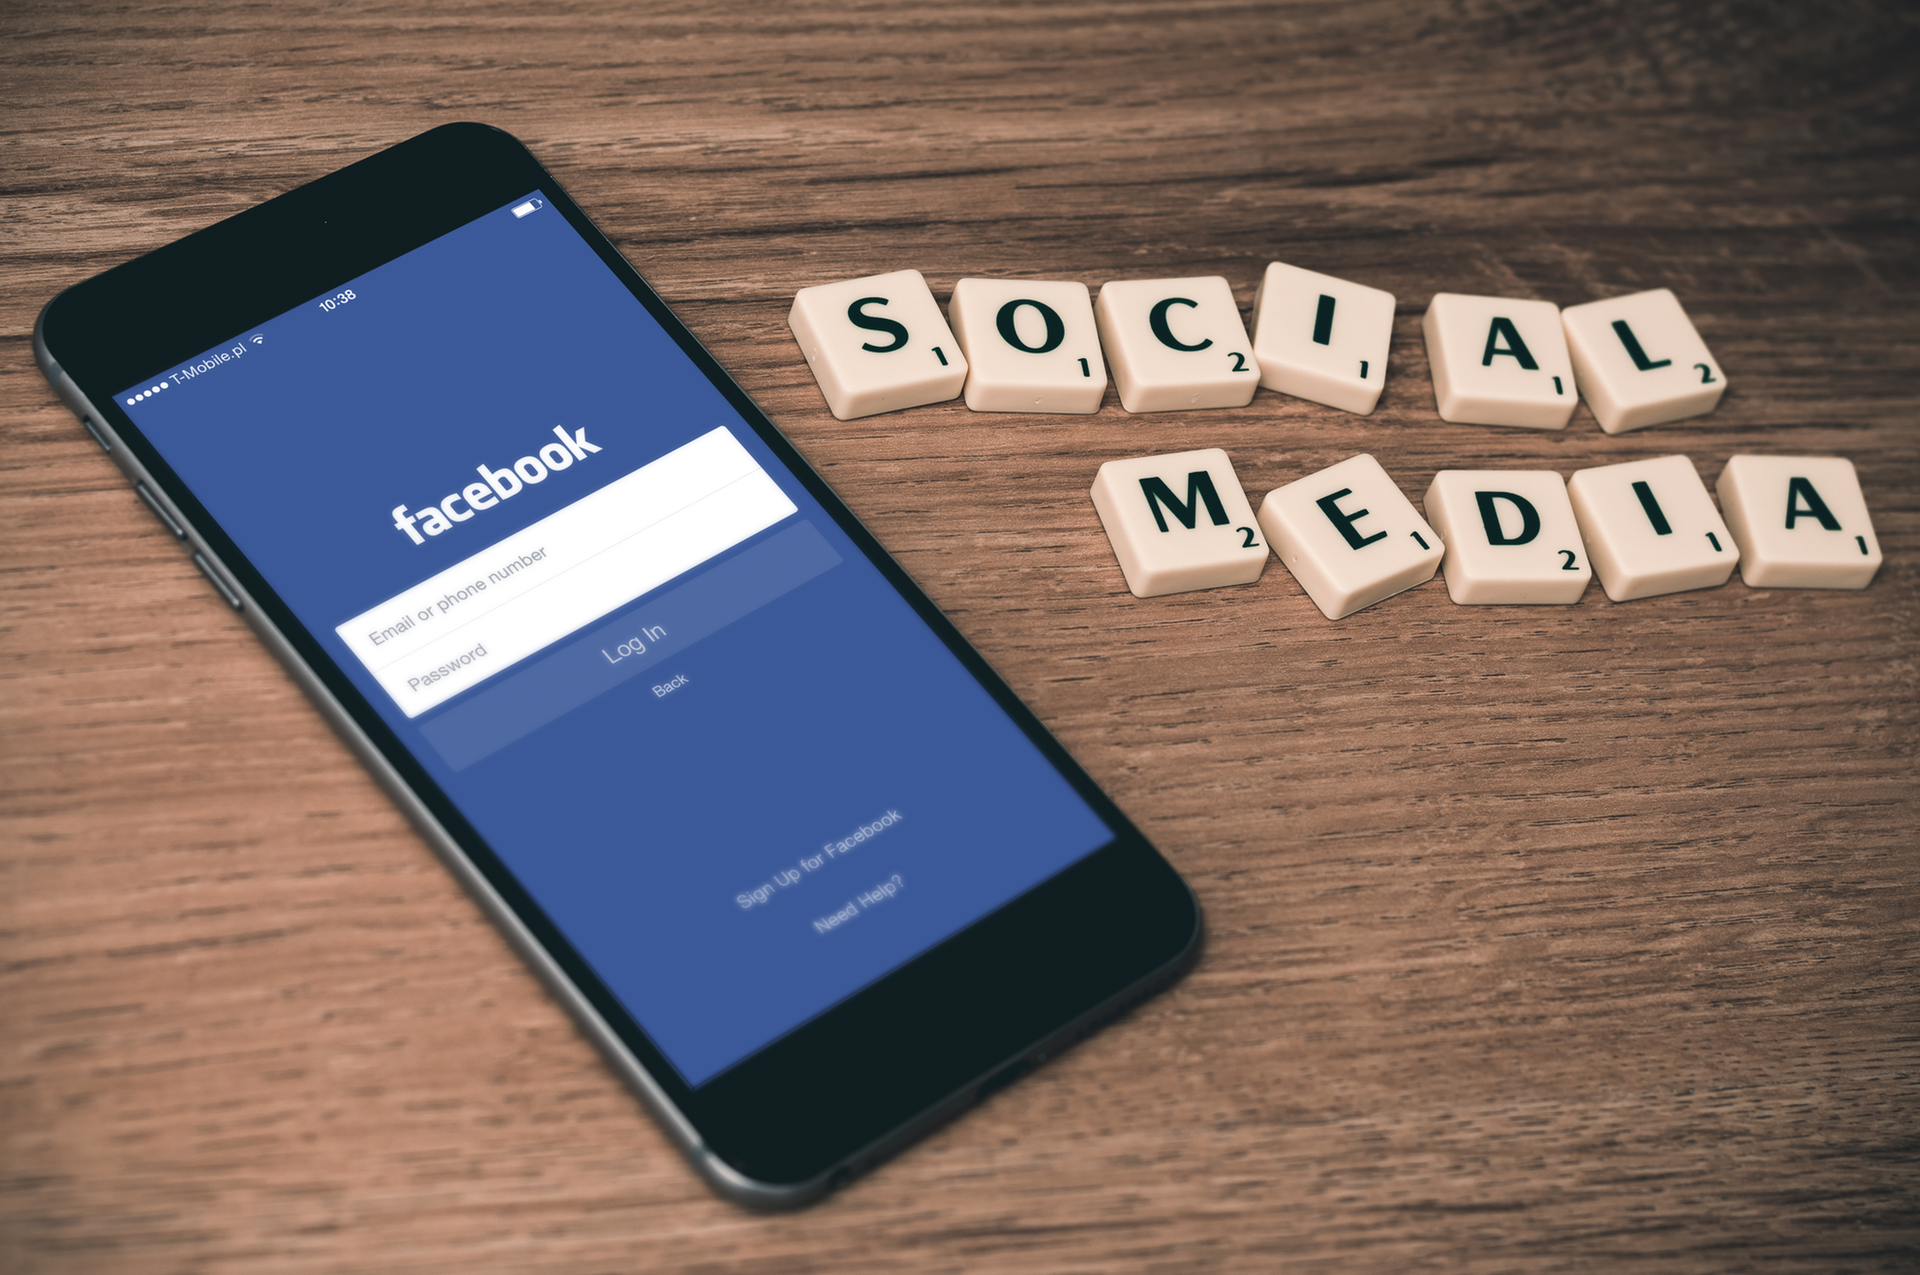 marketing mistakes - social media